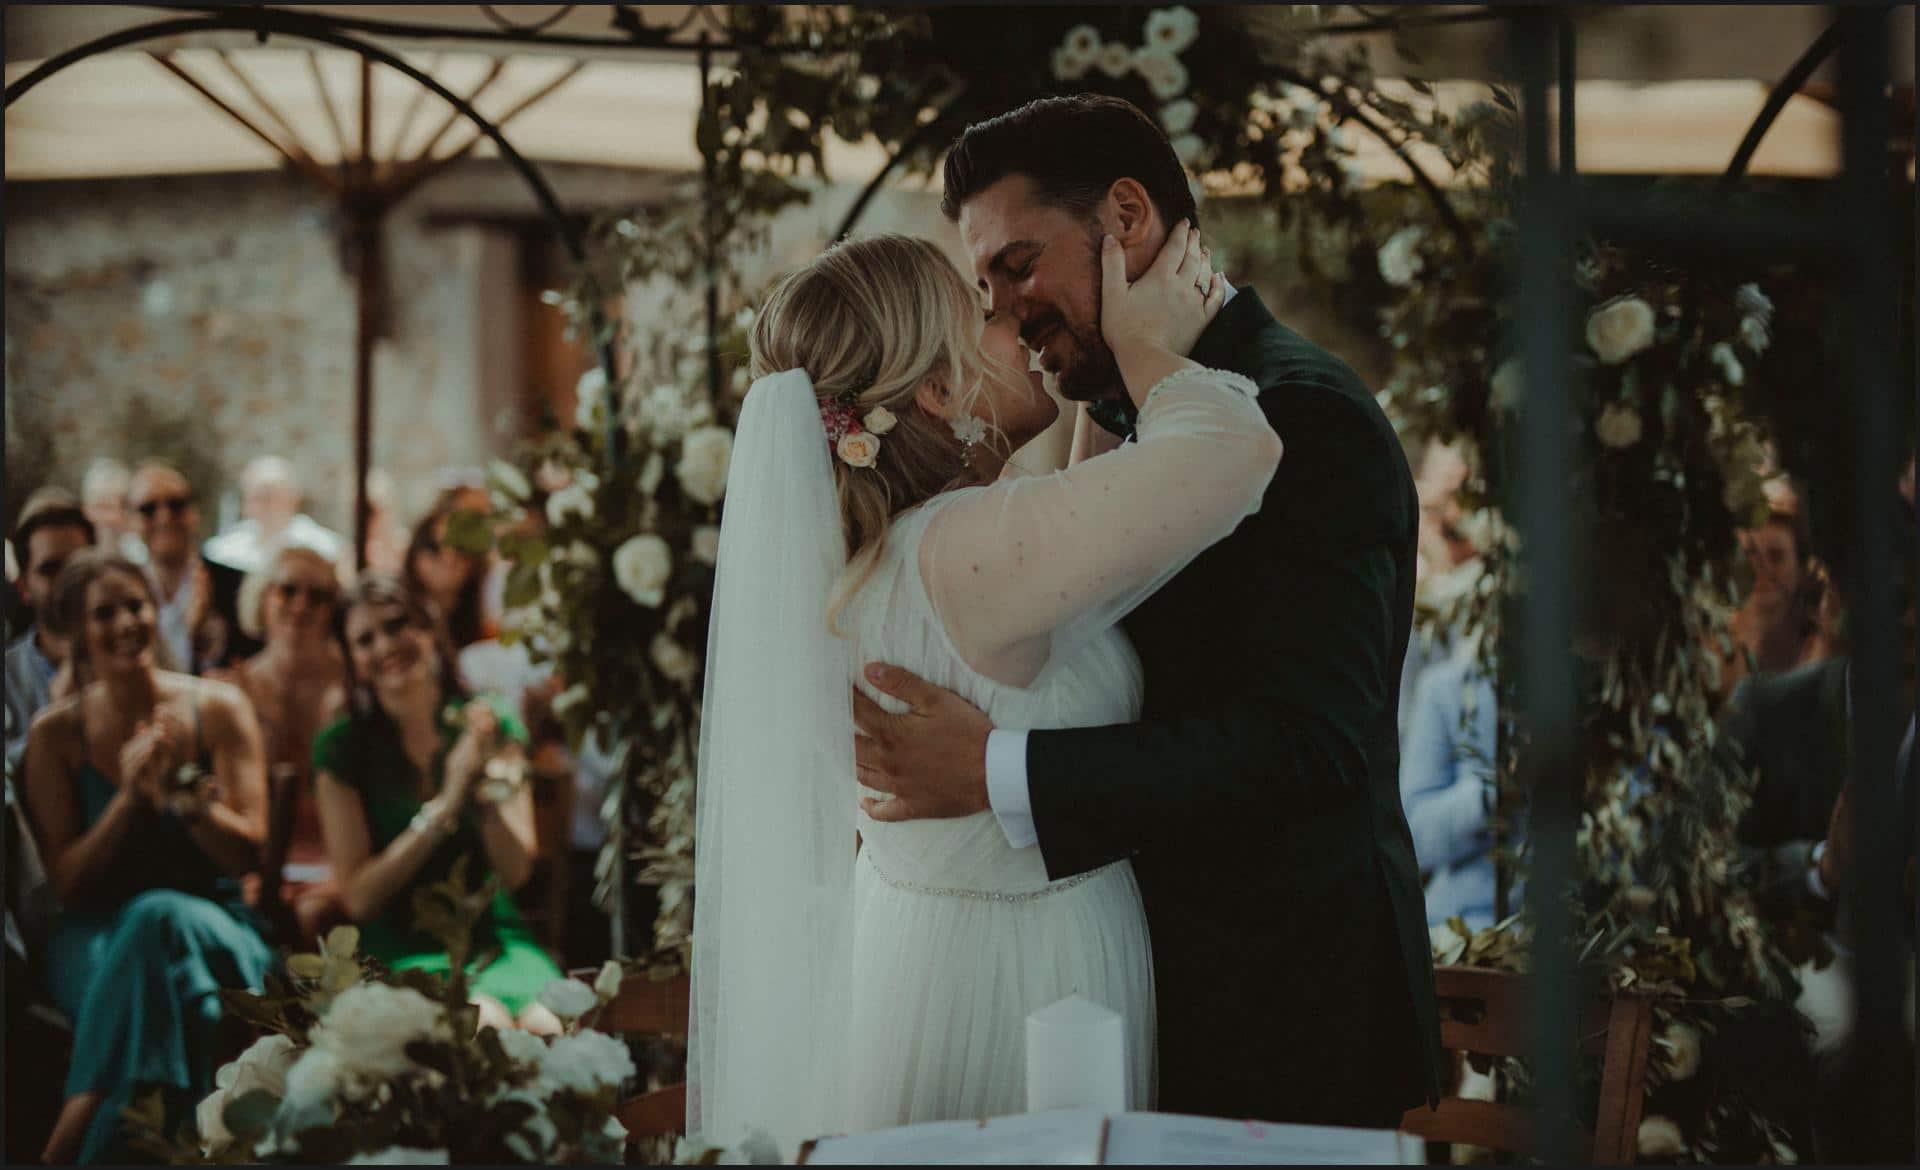 borgo di tragliata, wedding, rome, wedding in rome, bride, groom, kiss, ceremony, wedding in italy, rome wedding photographer